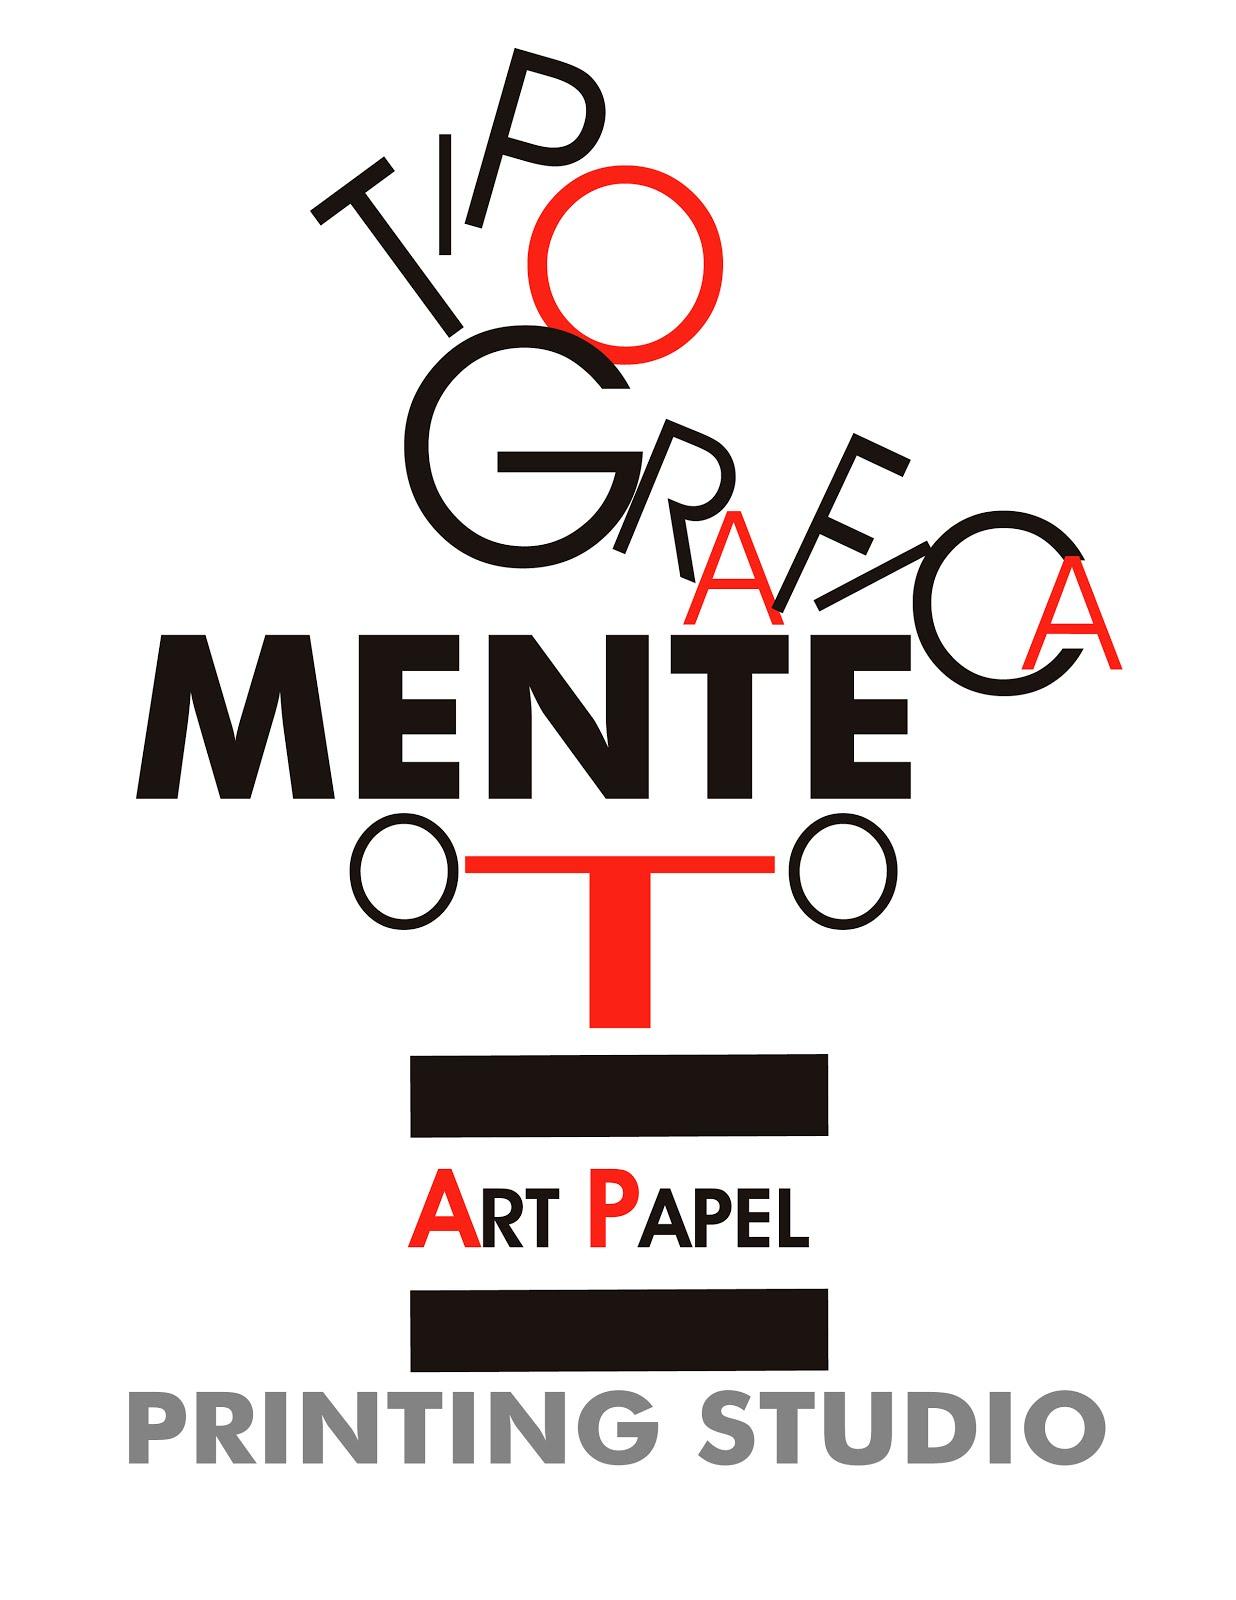 TipoGráficaMente Artpapel Printing Studio